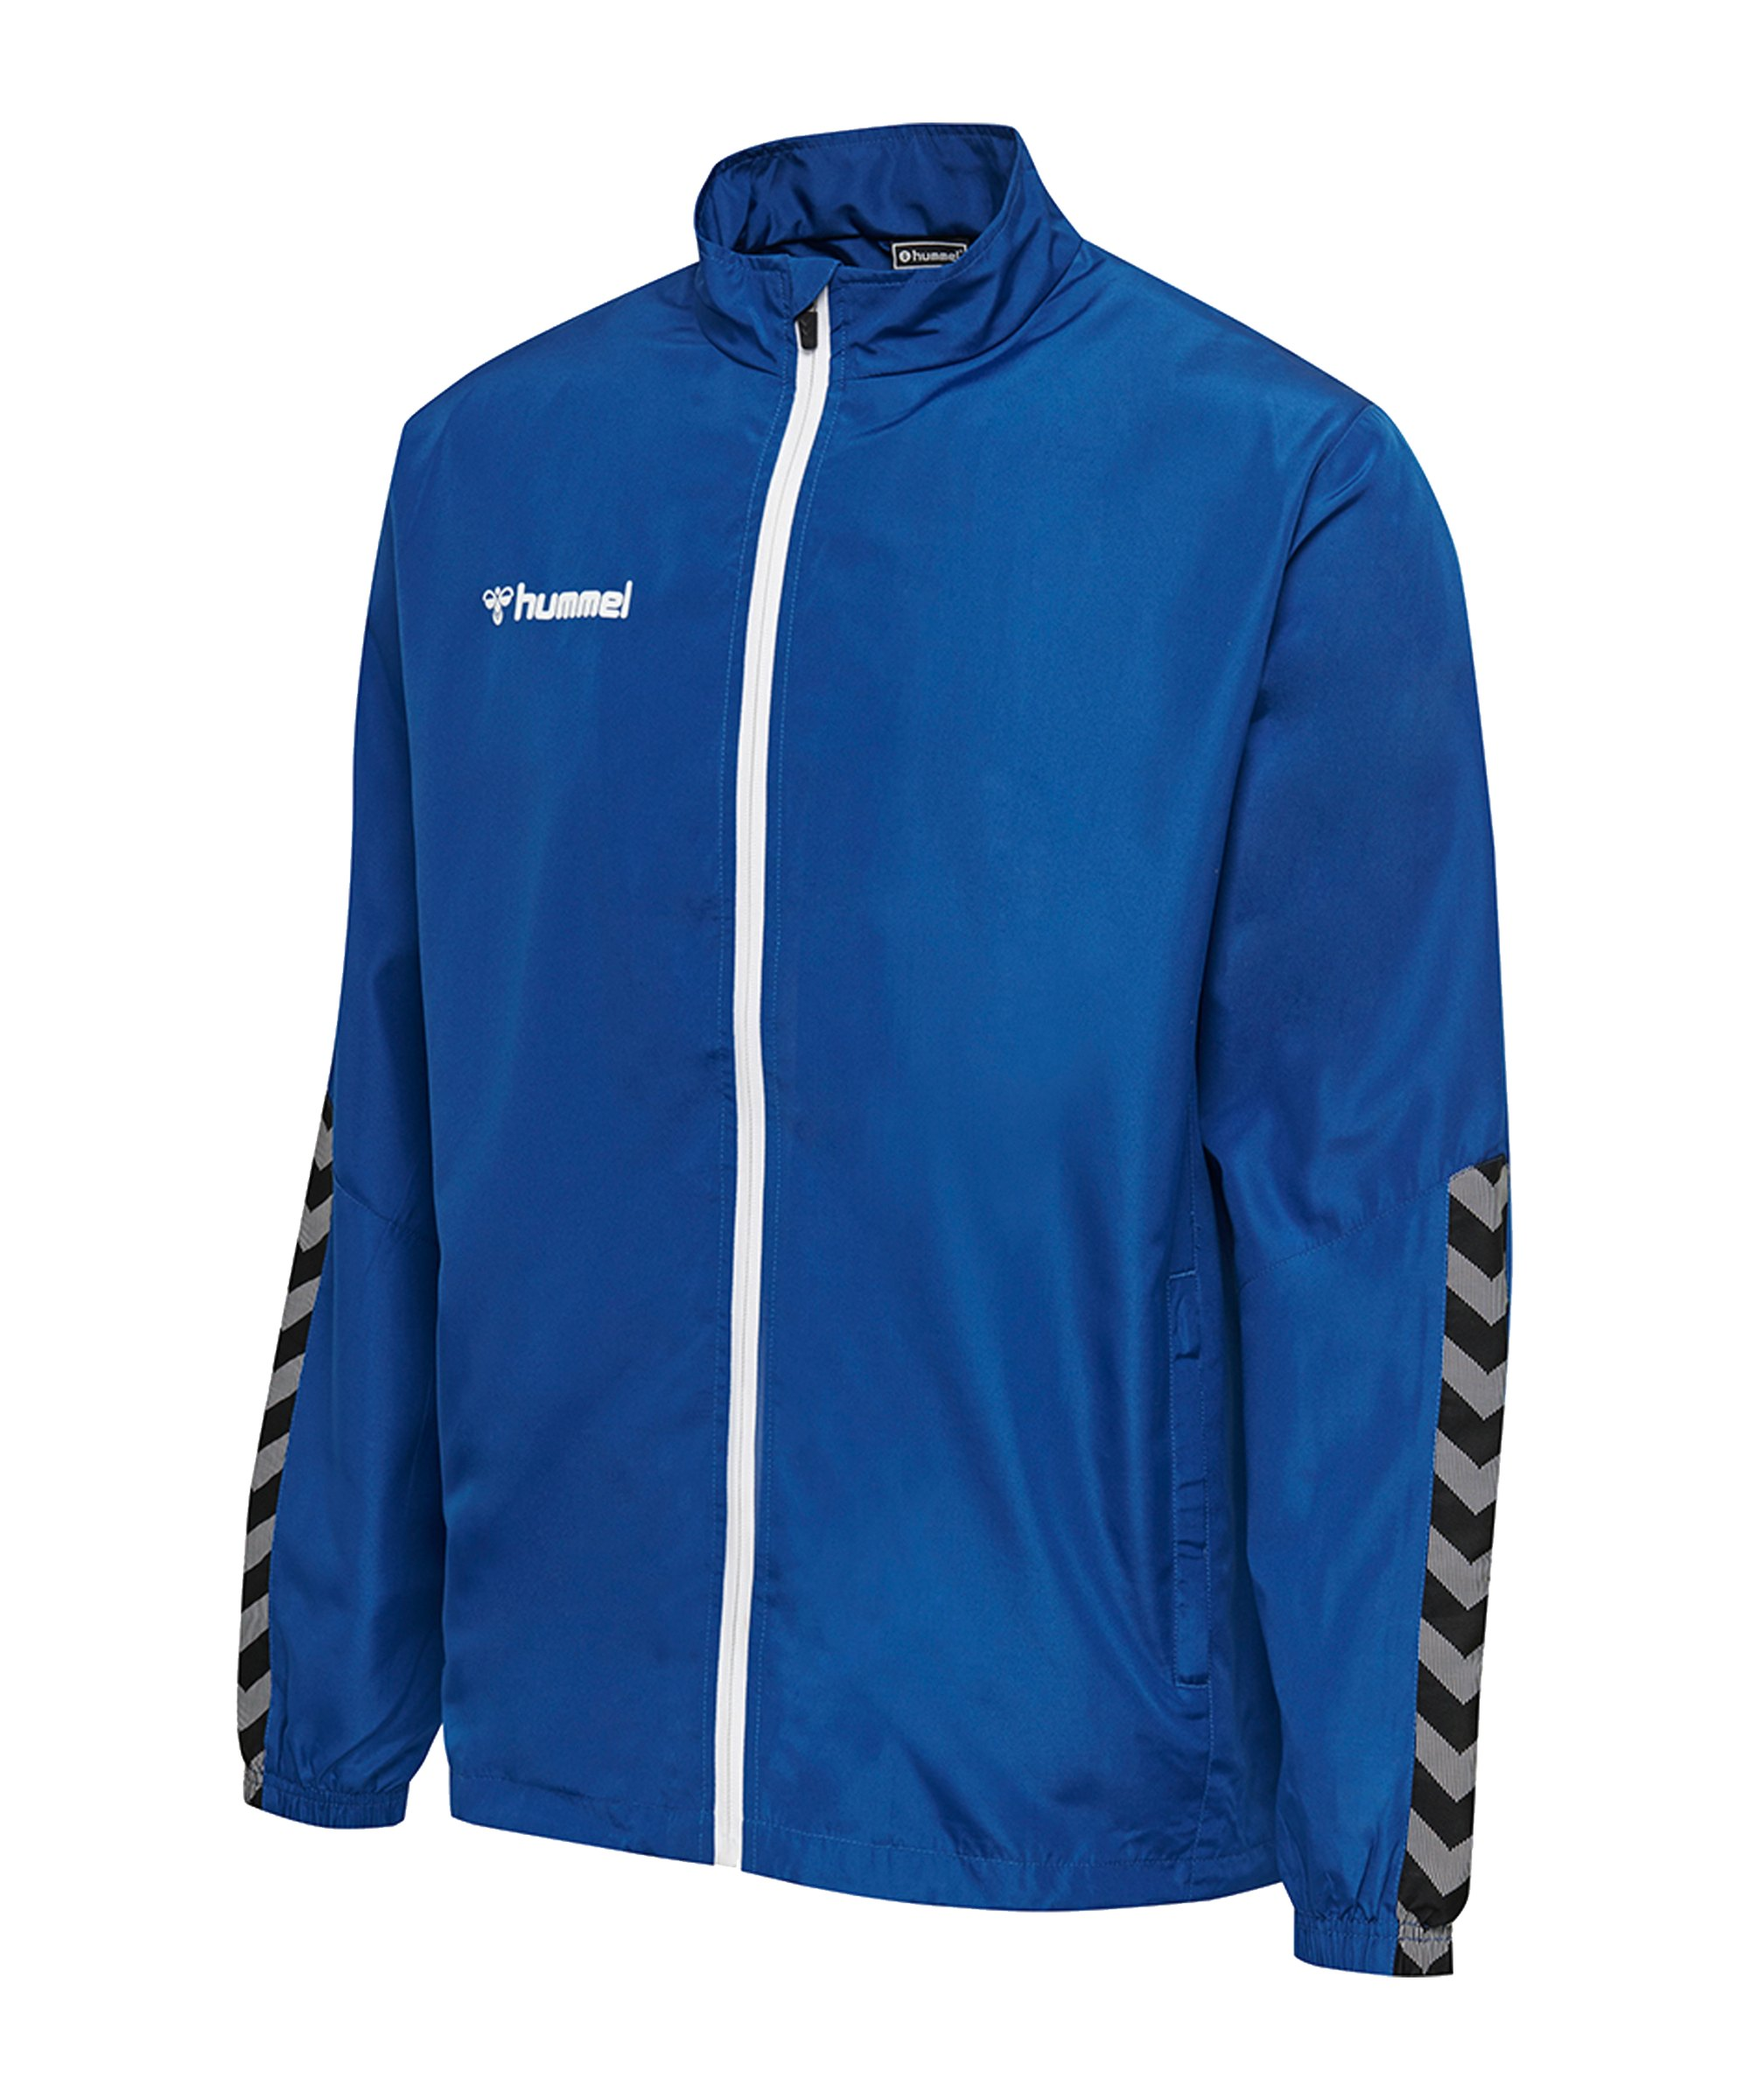 Hummel Authentic Micro Trainingsjacke F7045 - blau